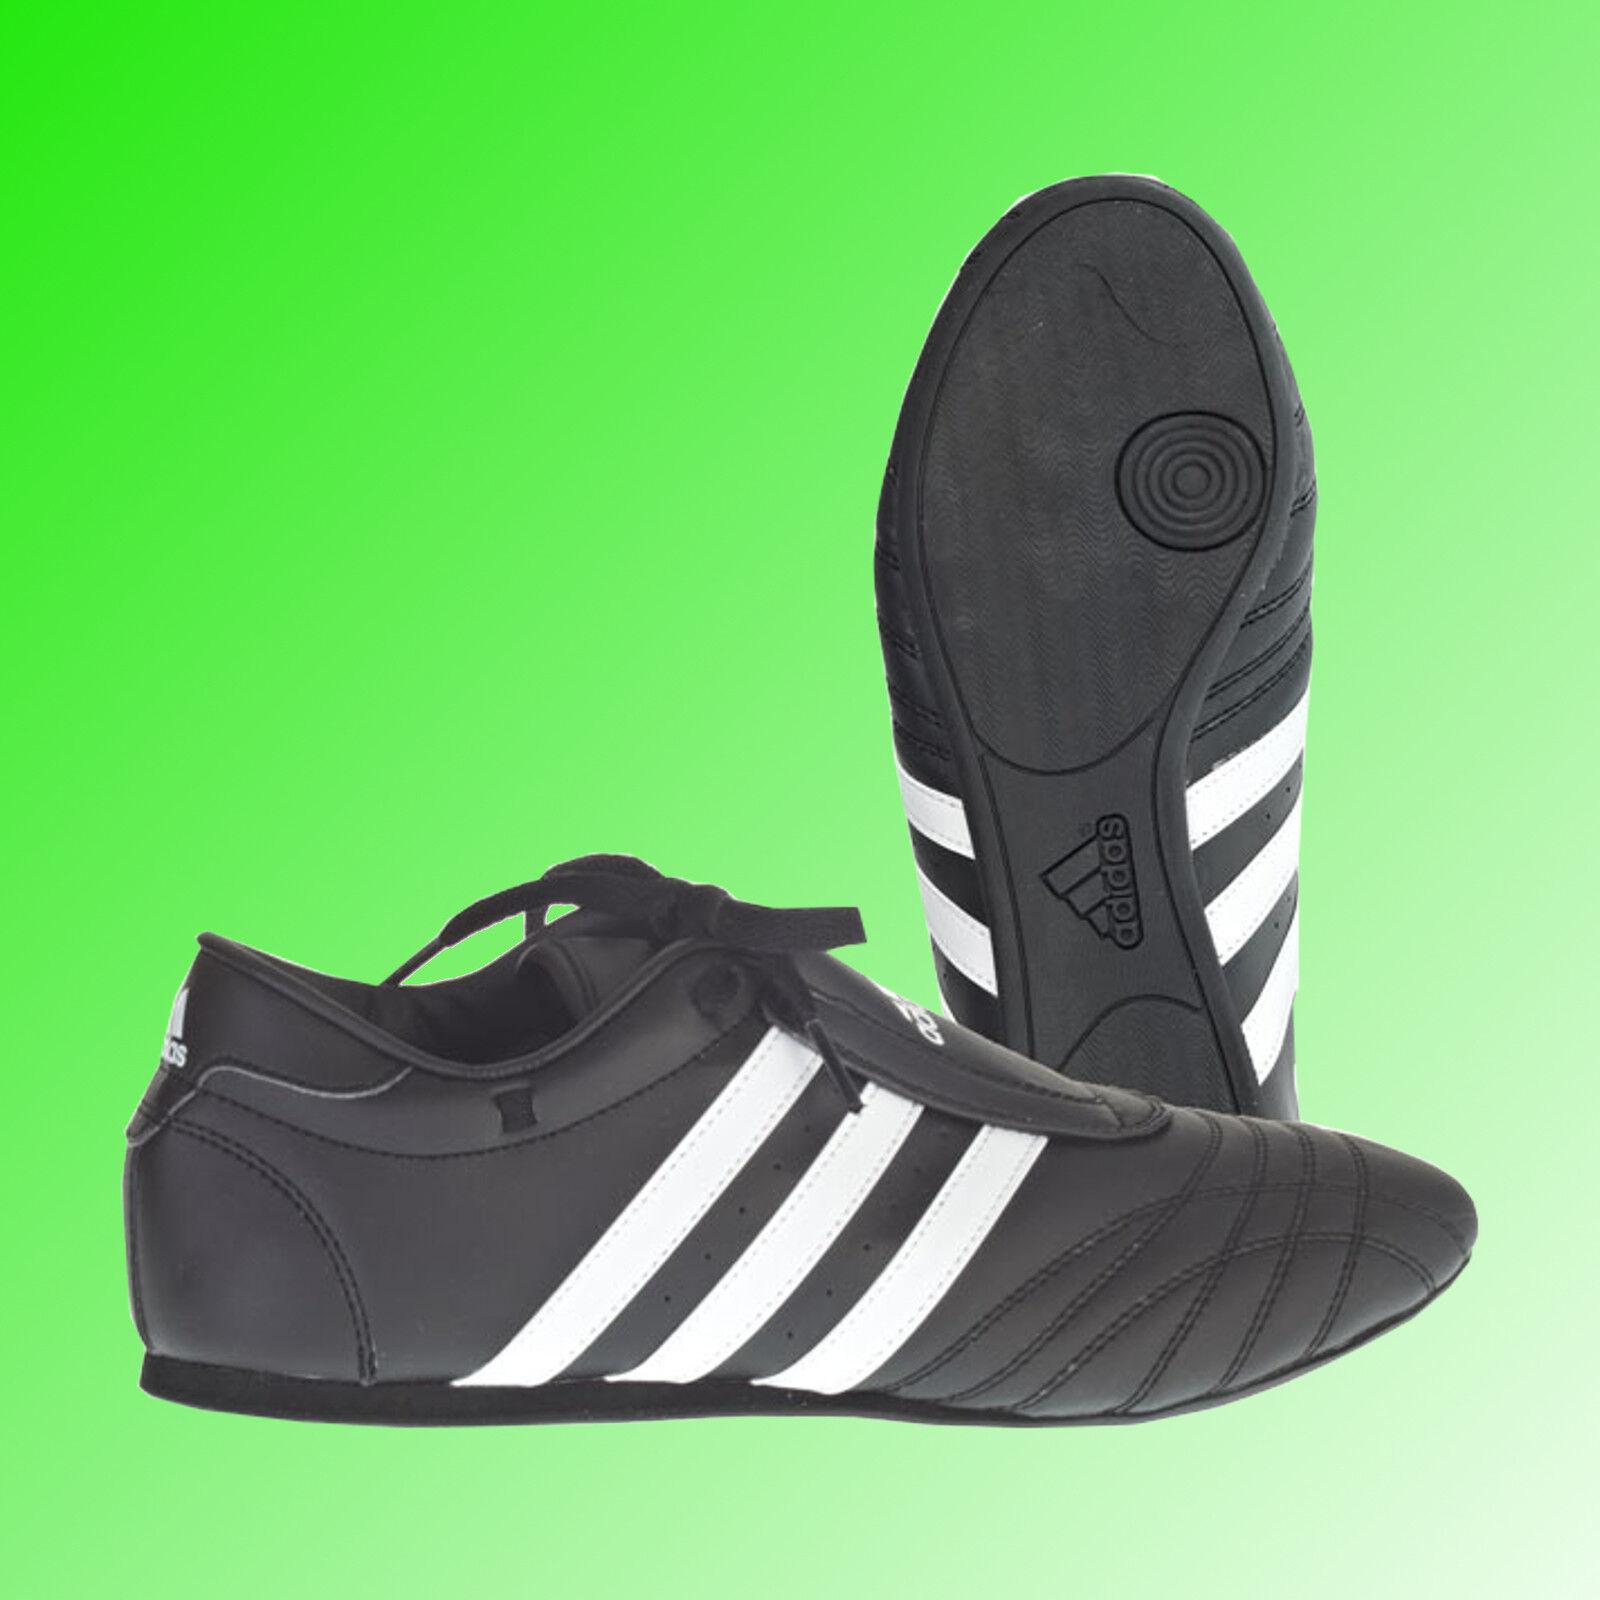 Adidas® SM II Taekwondo TKD Kampfsport Schuhe Sneaker Slipper schwarz 37 - 48